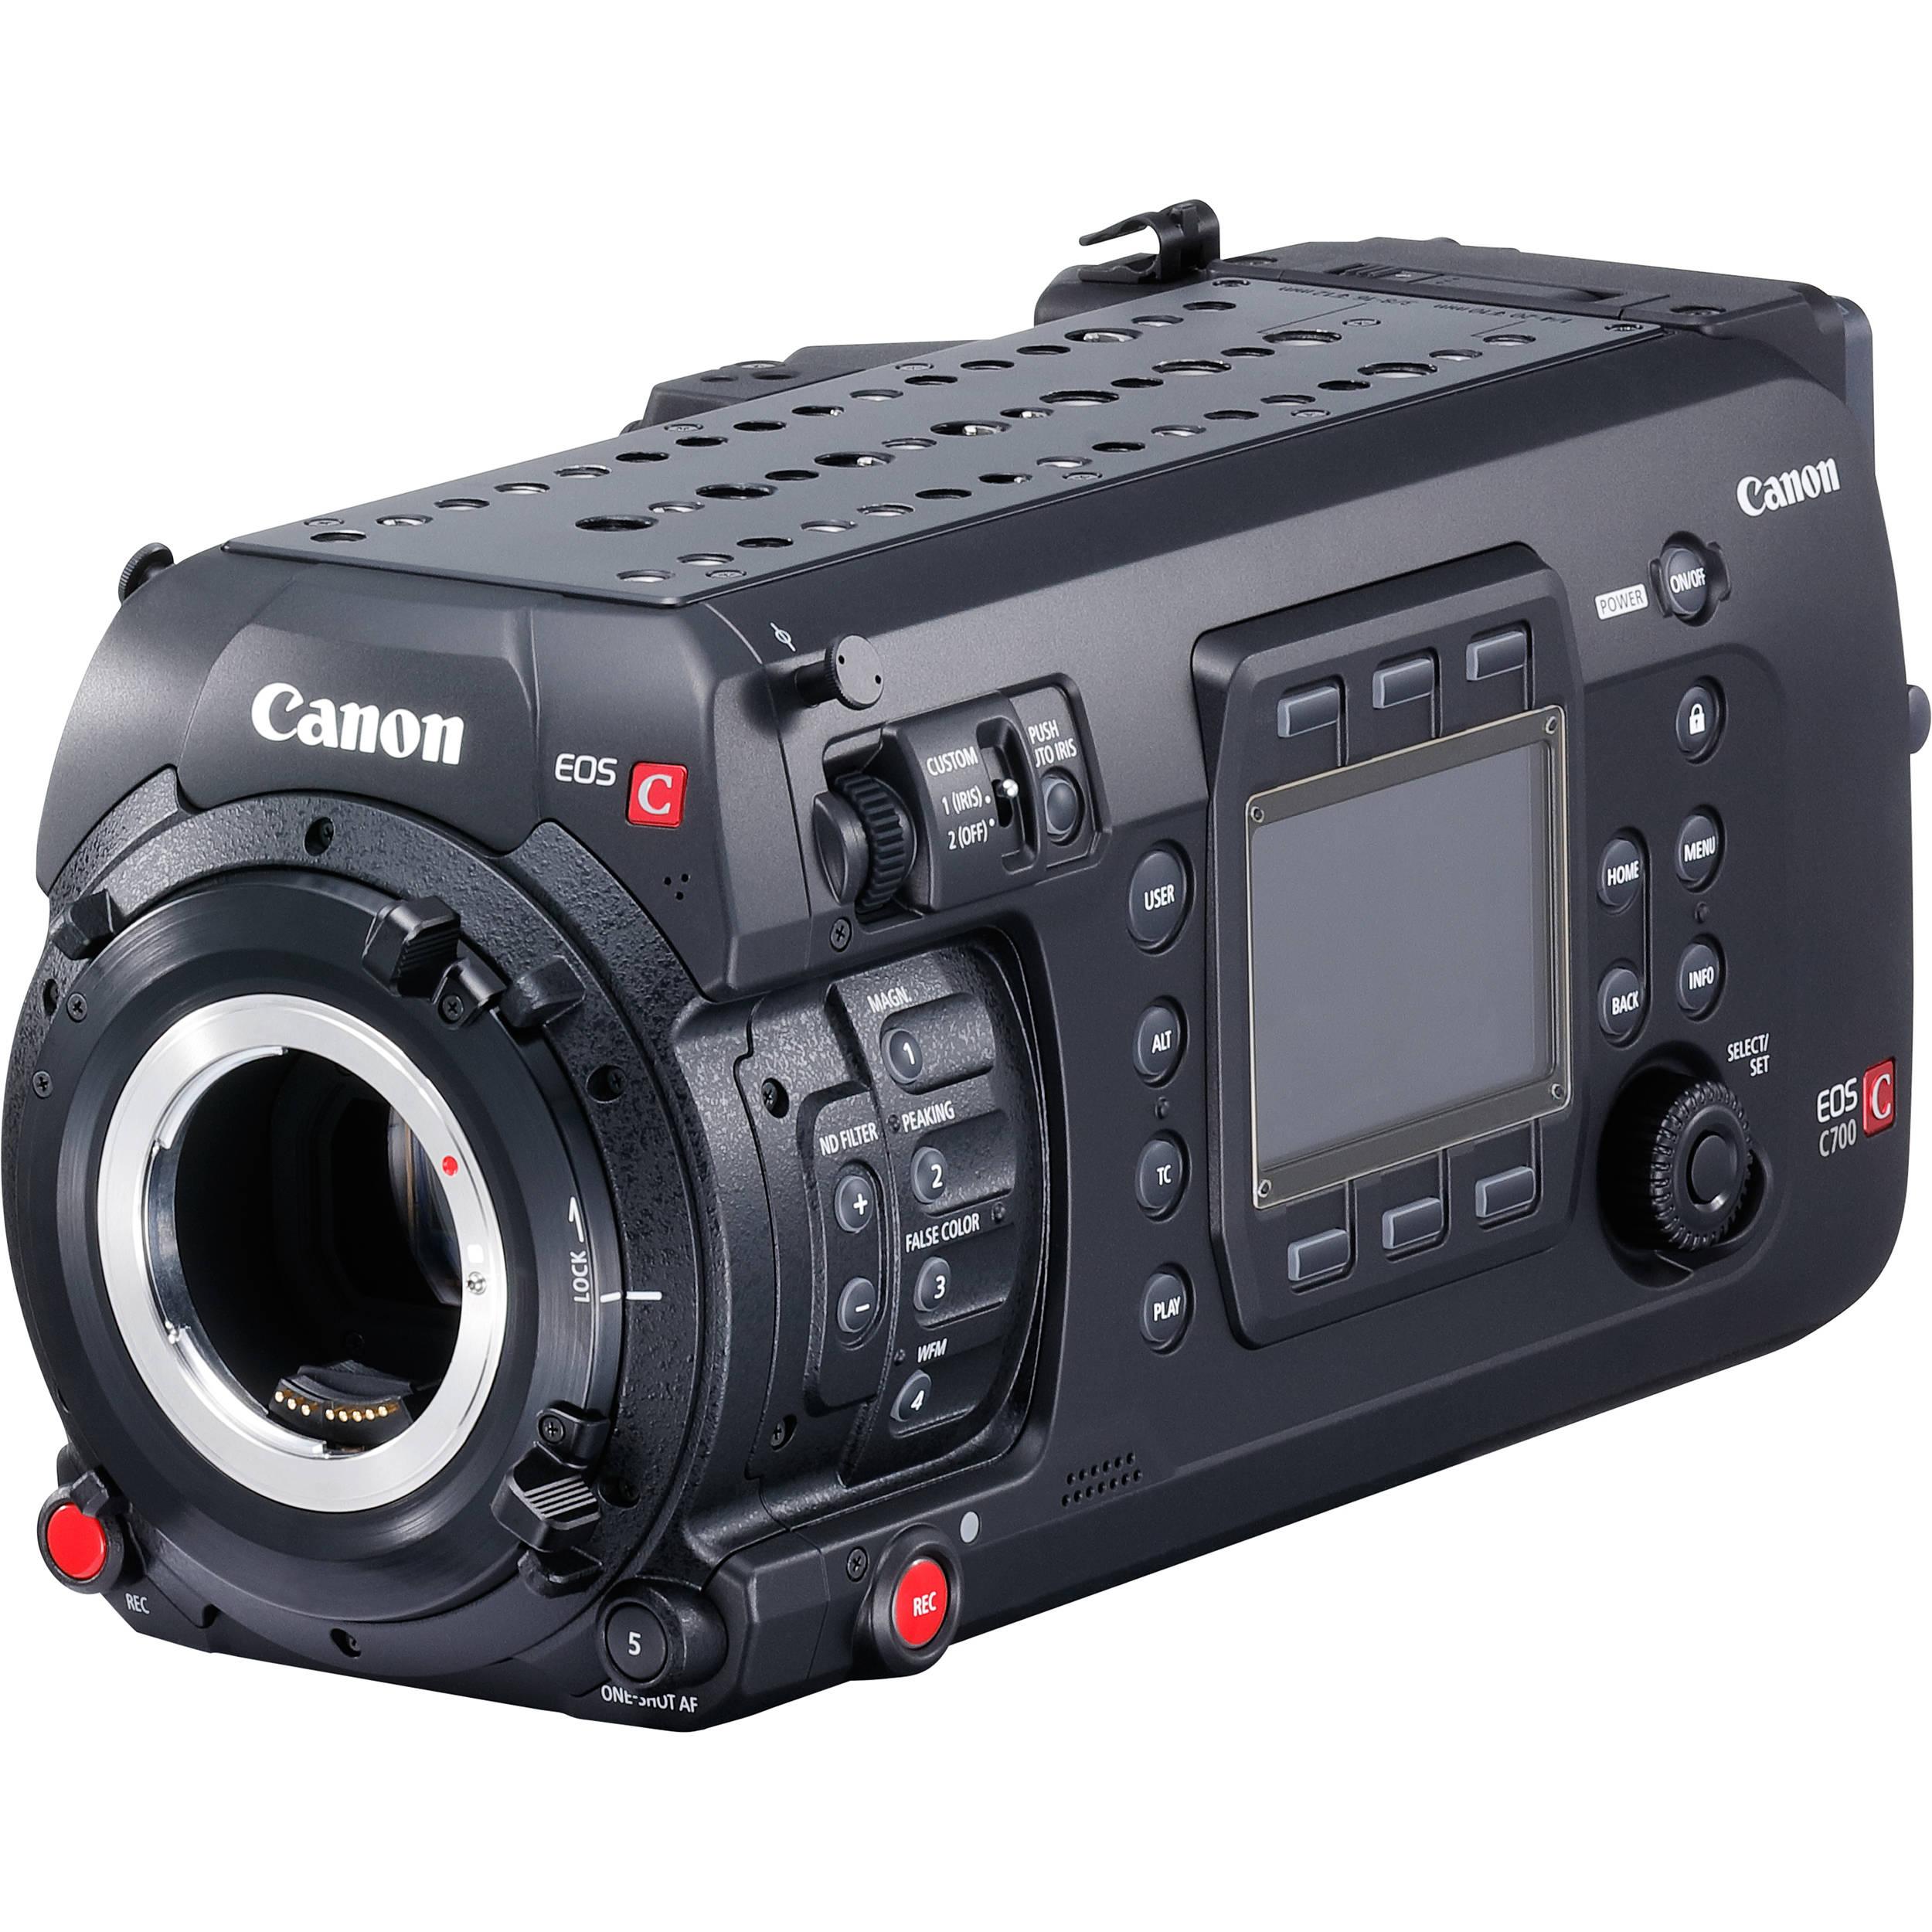 canon eos c700 cinema camera 1454c002 bamph photo video